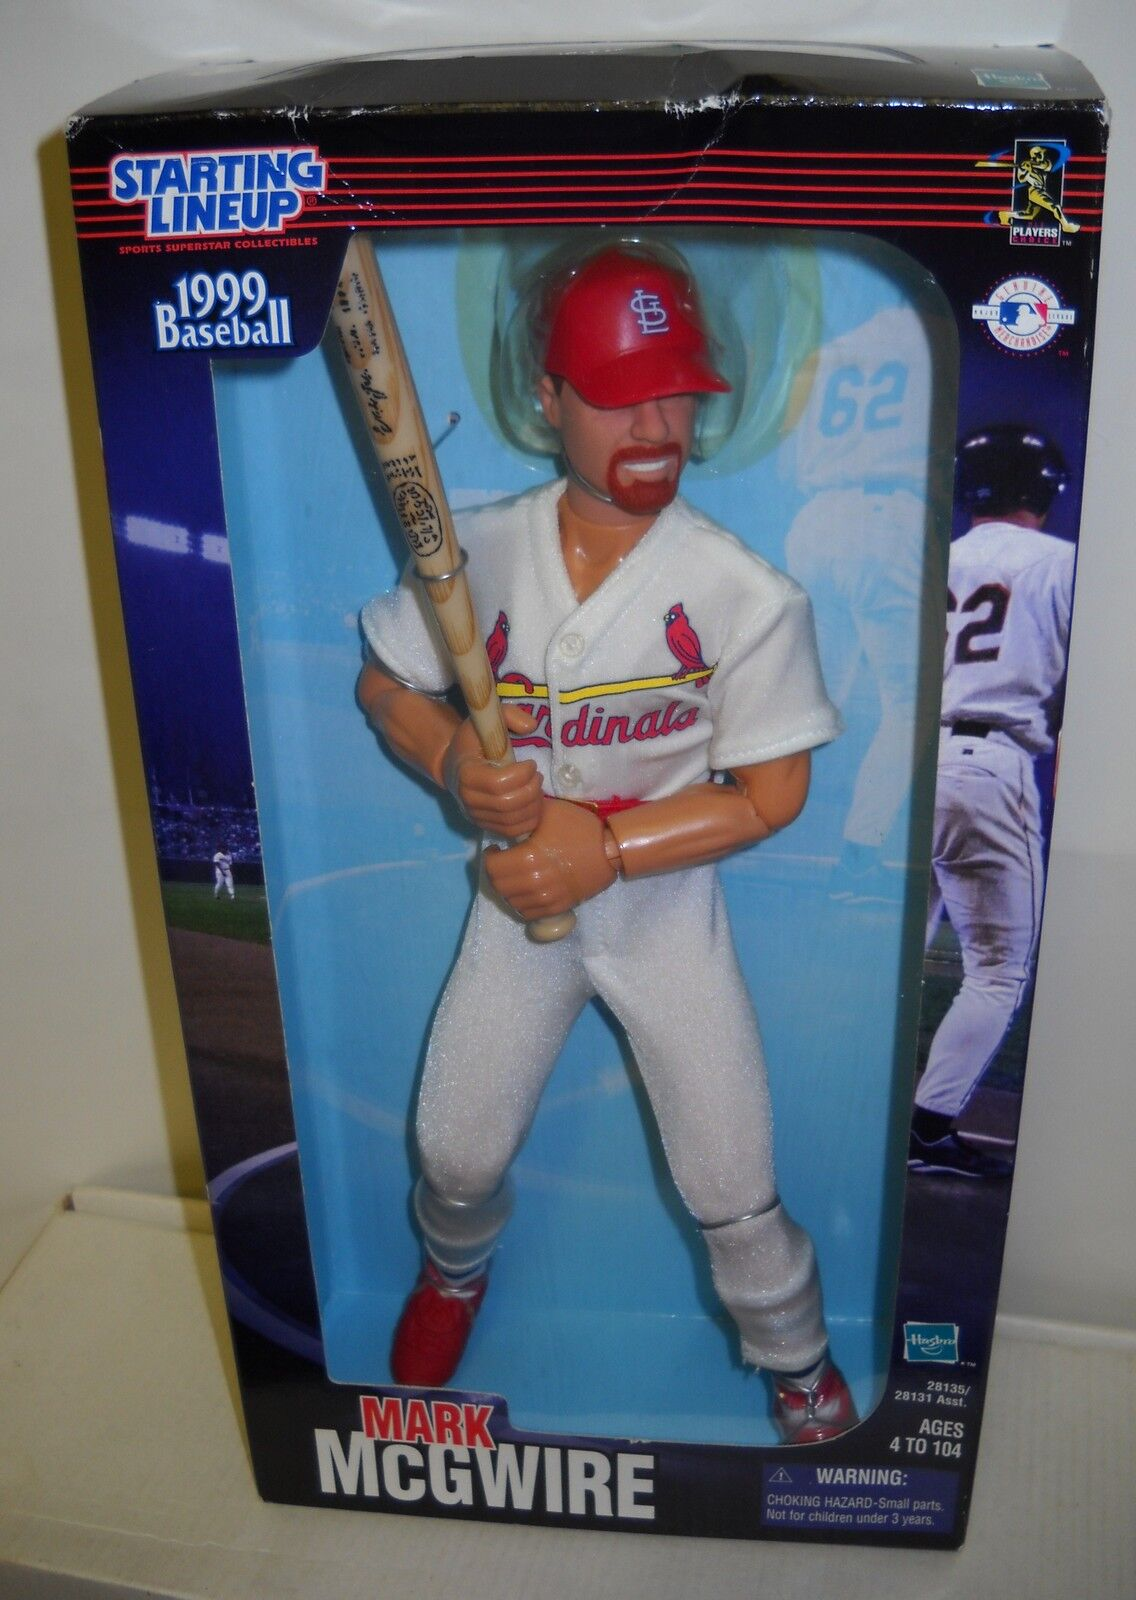 3317 NRFB Hasbro Starting Starting Starting Lineup 1999 Baseball 12